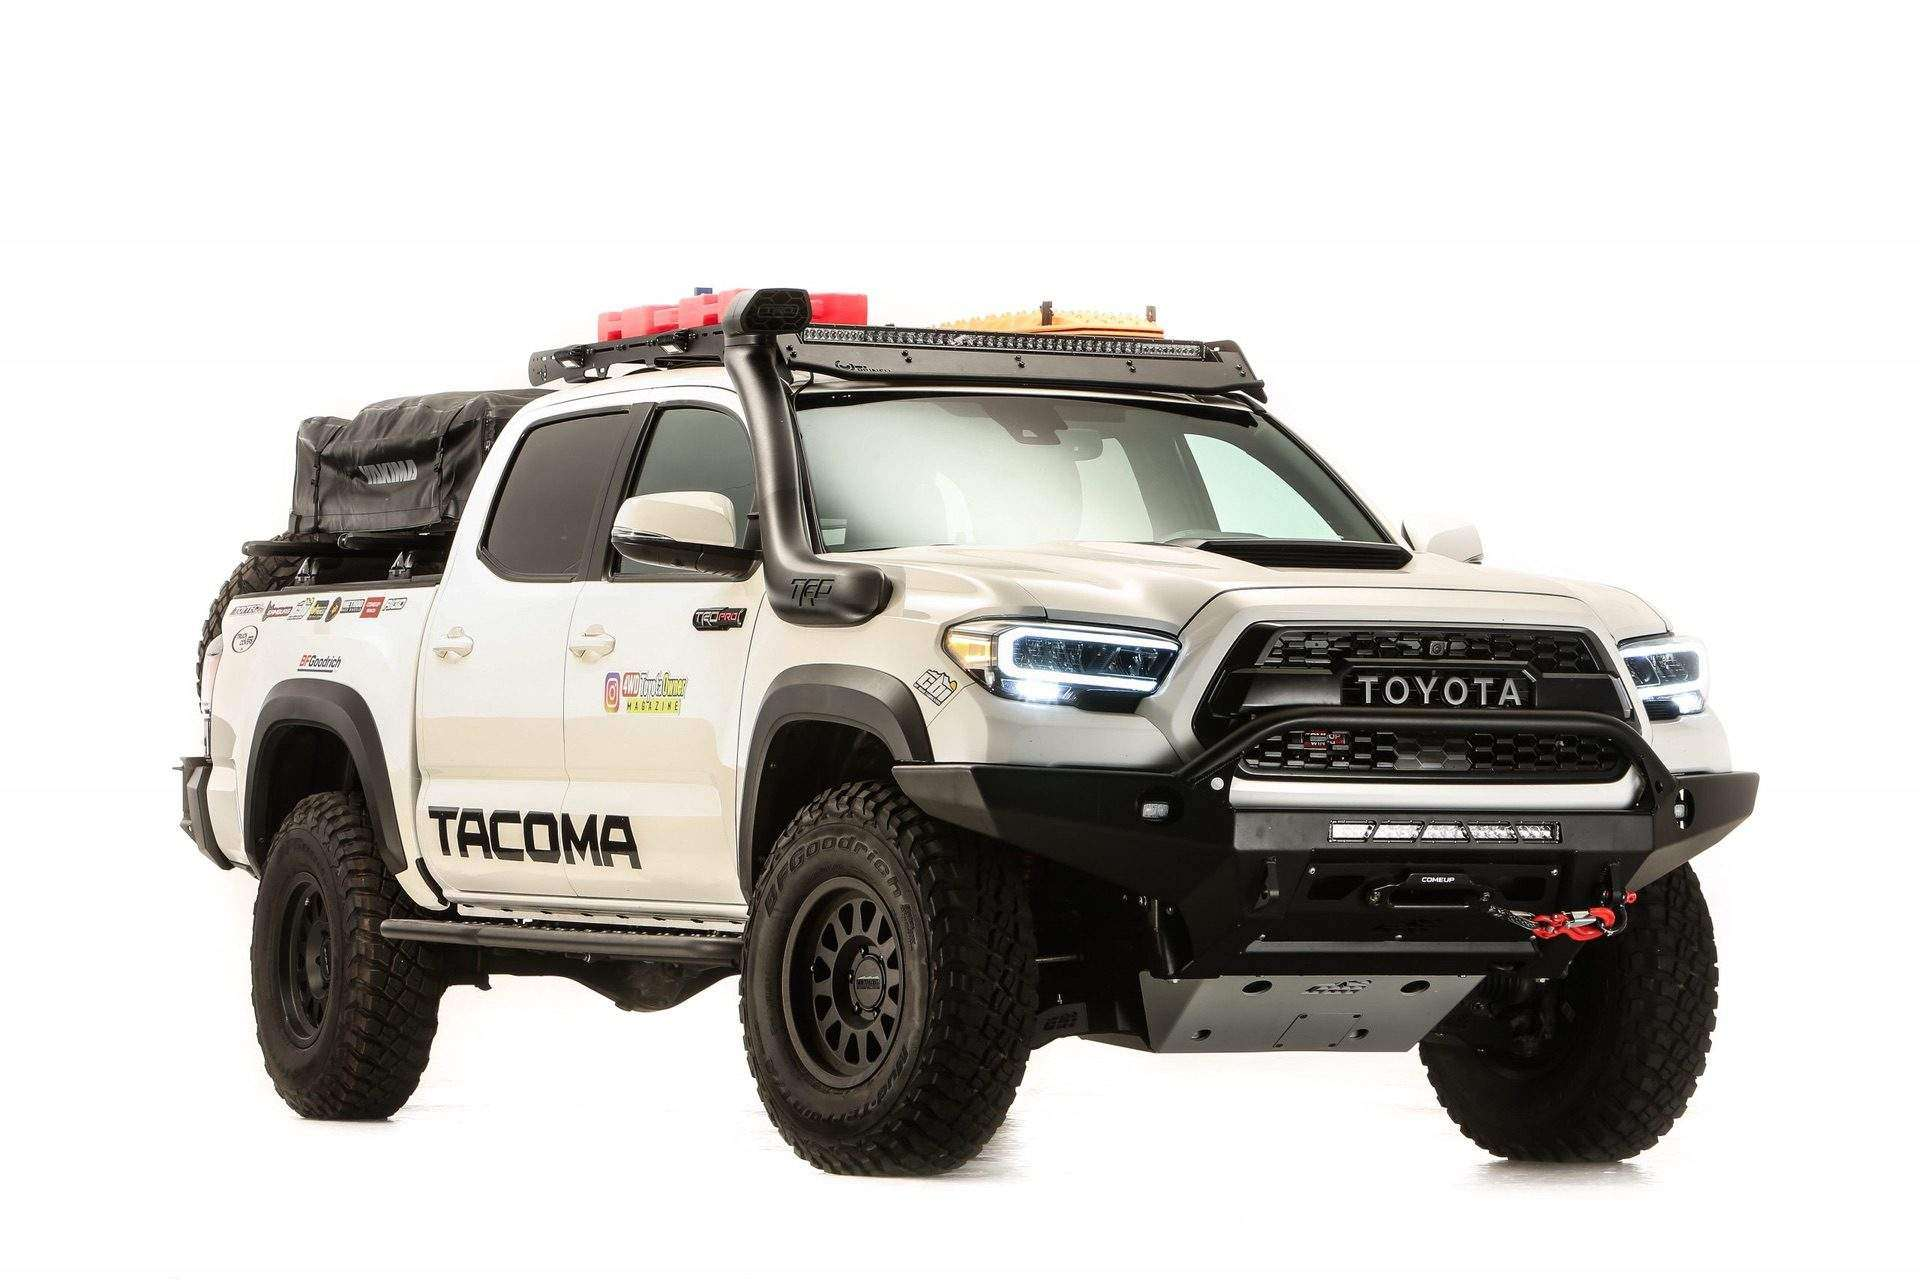 2020_SEMA_4WD_Overland-Ready_Tacoma_03_HERO-scaled